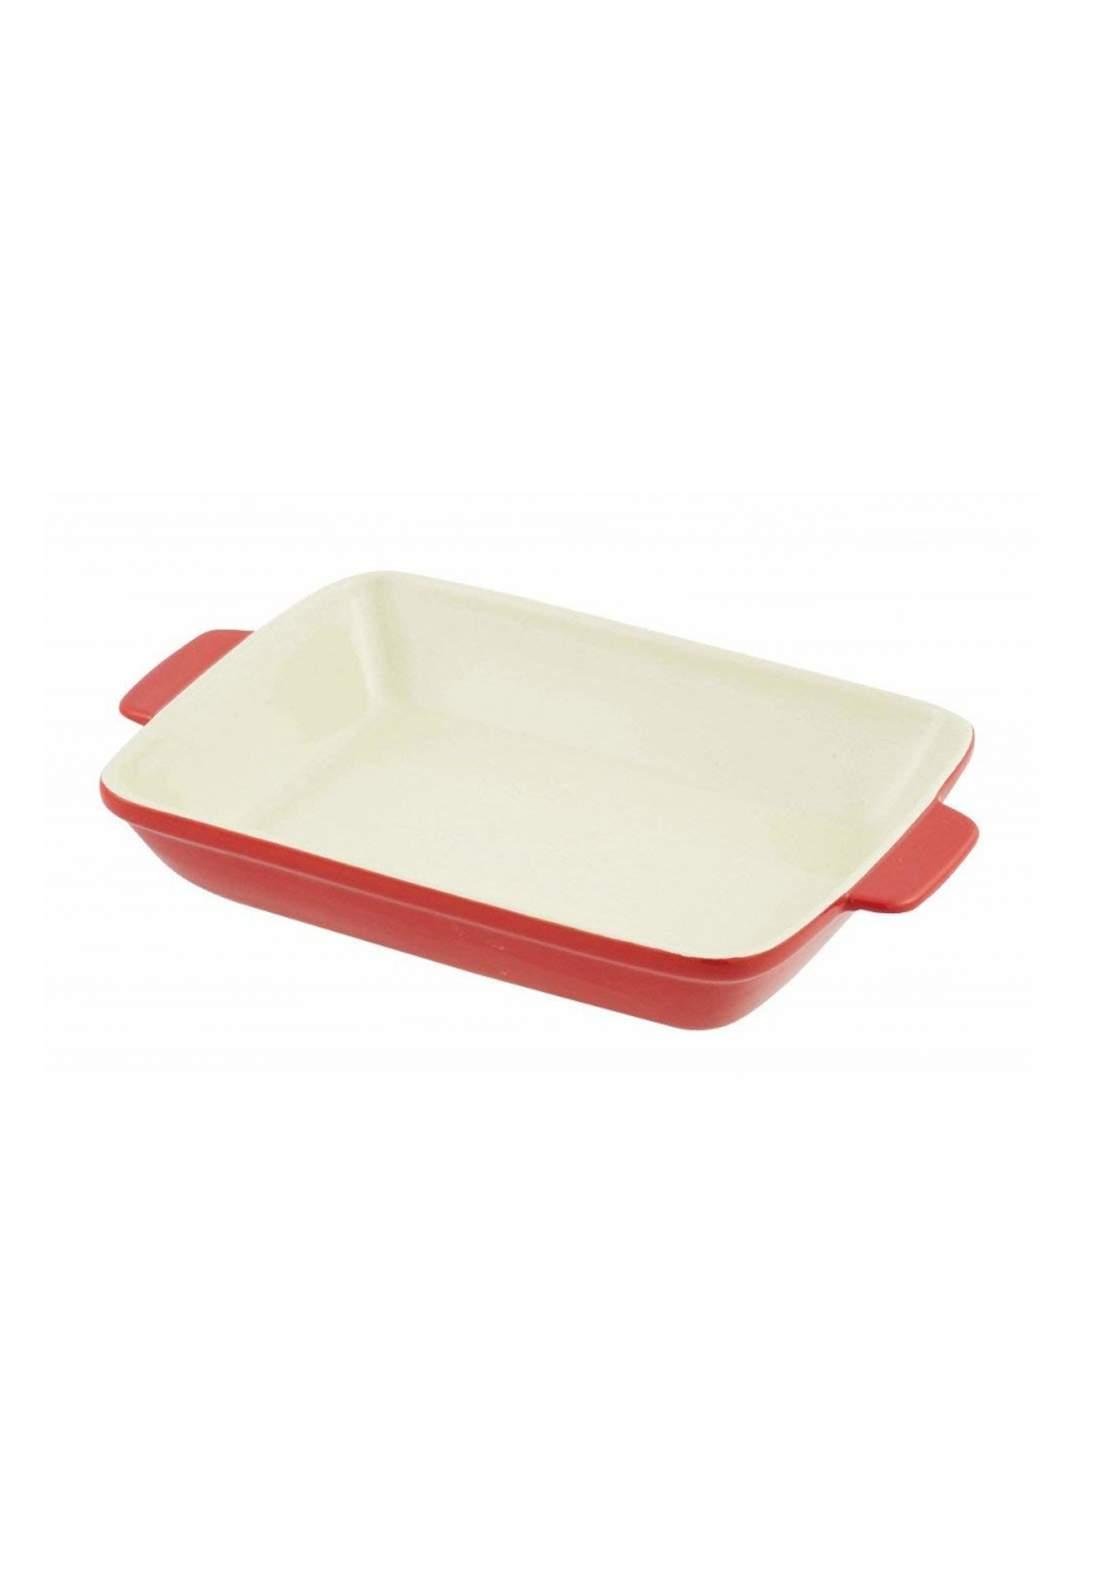 Pearl Metal  L-1825 Square Dish Heat-Resistant Redبايركس حراري